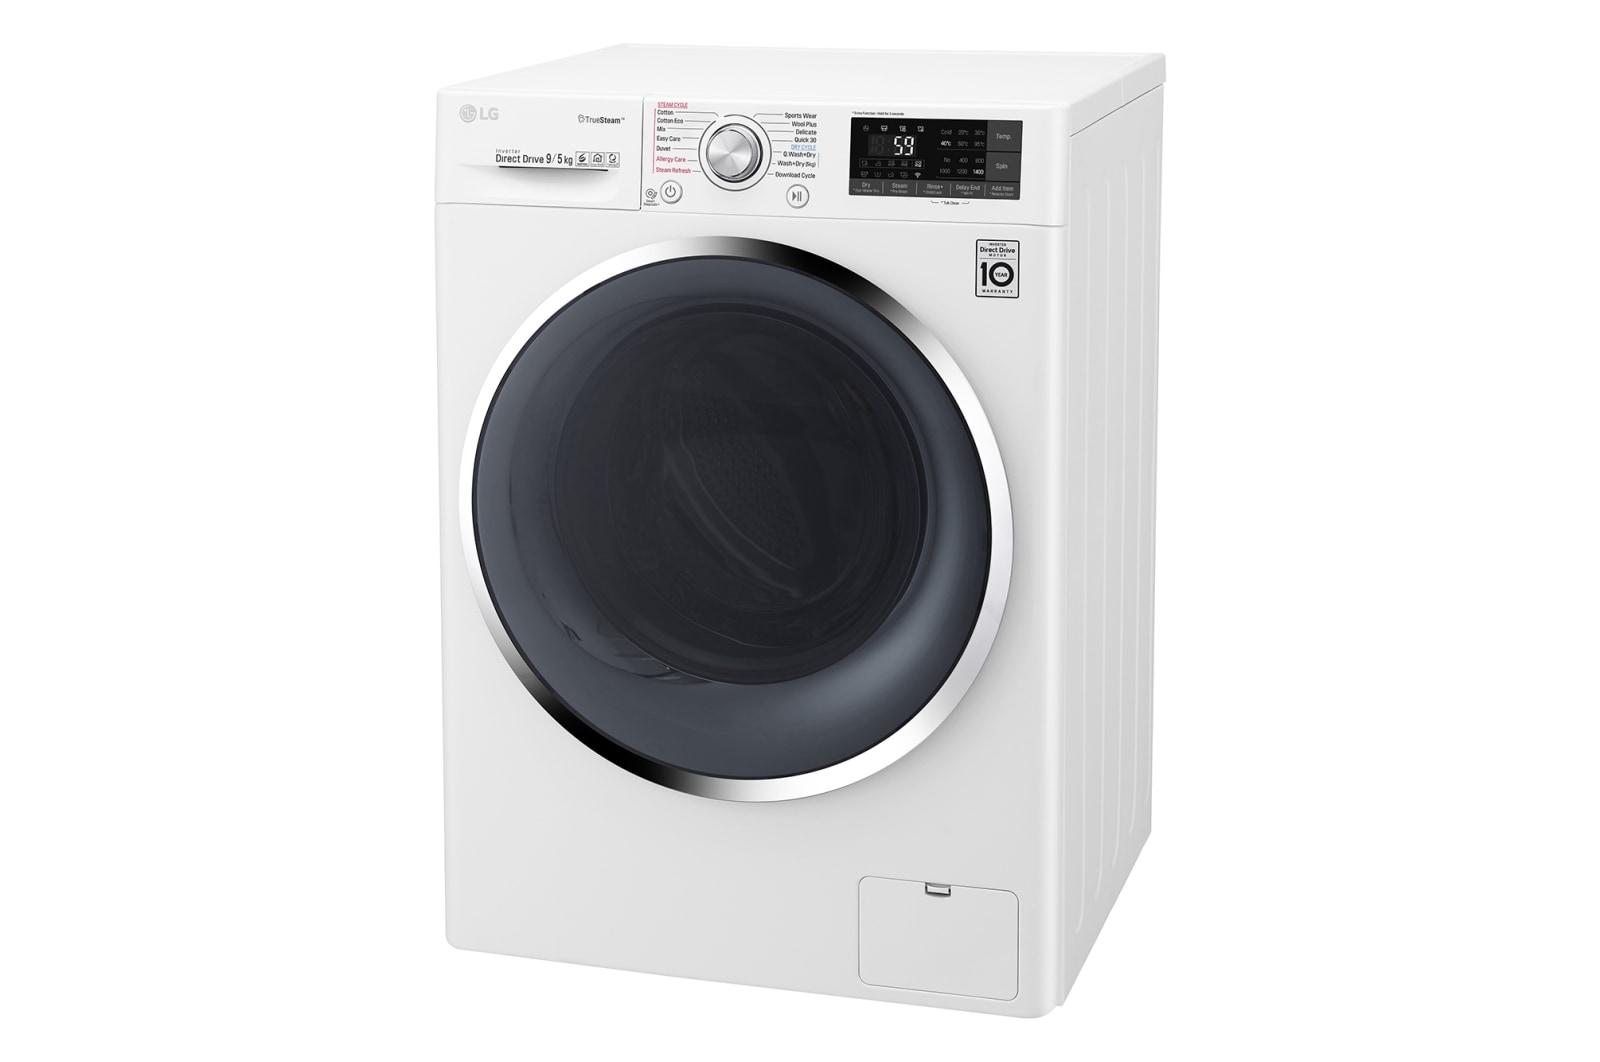 LG Washer Dryer Combo | WTW1409HCW | LG New Zealand